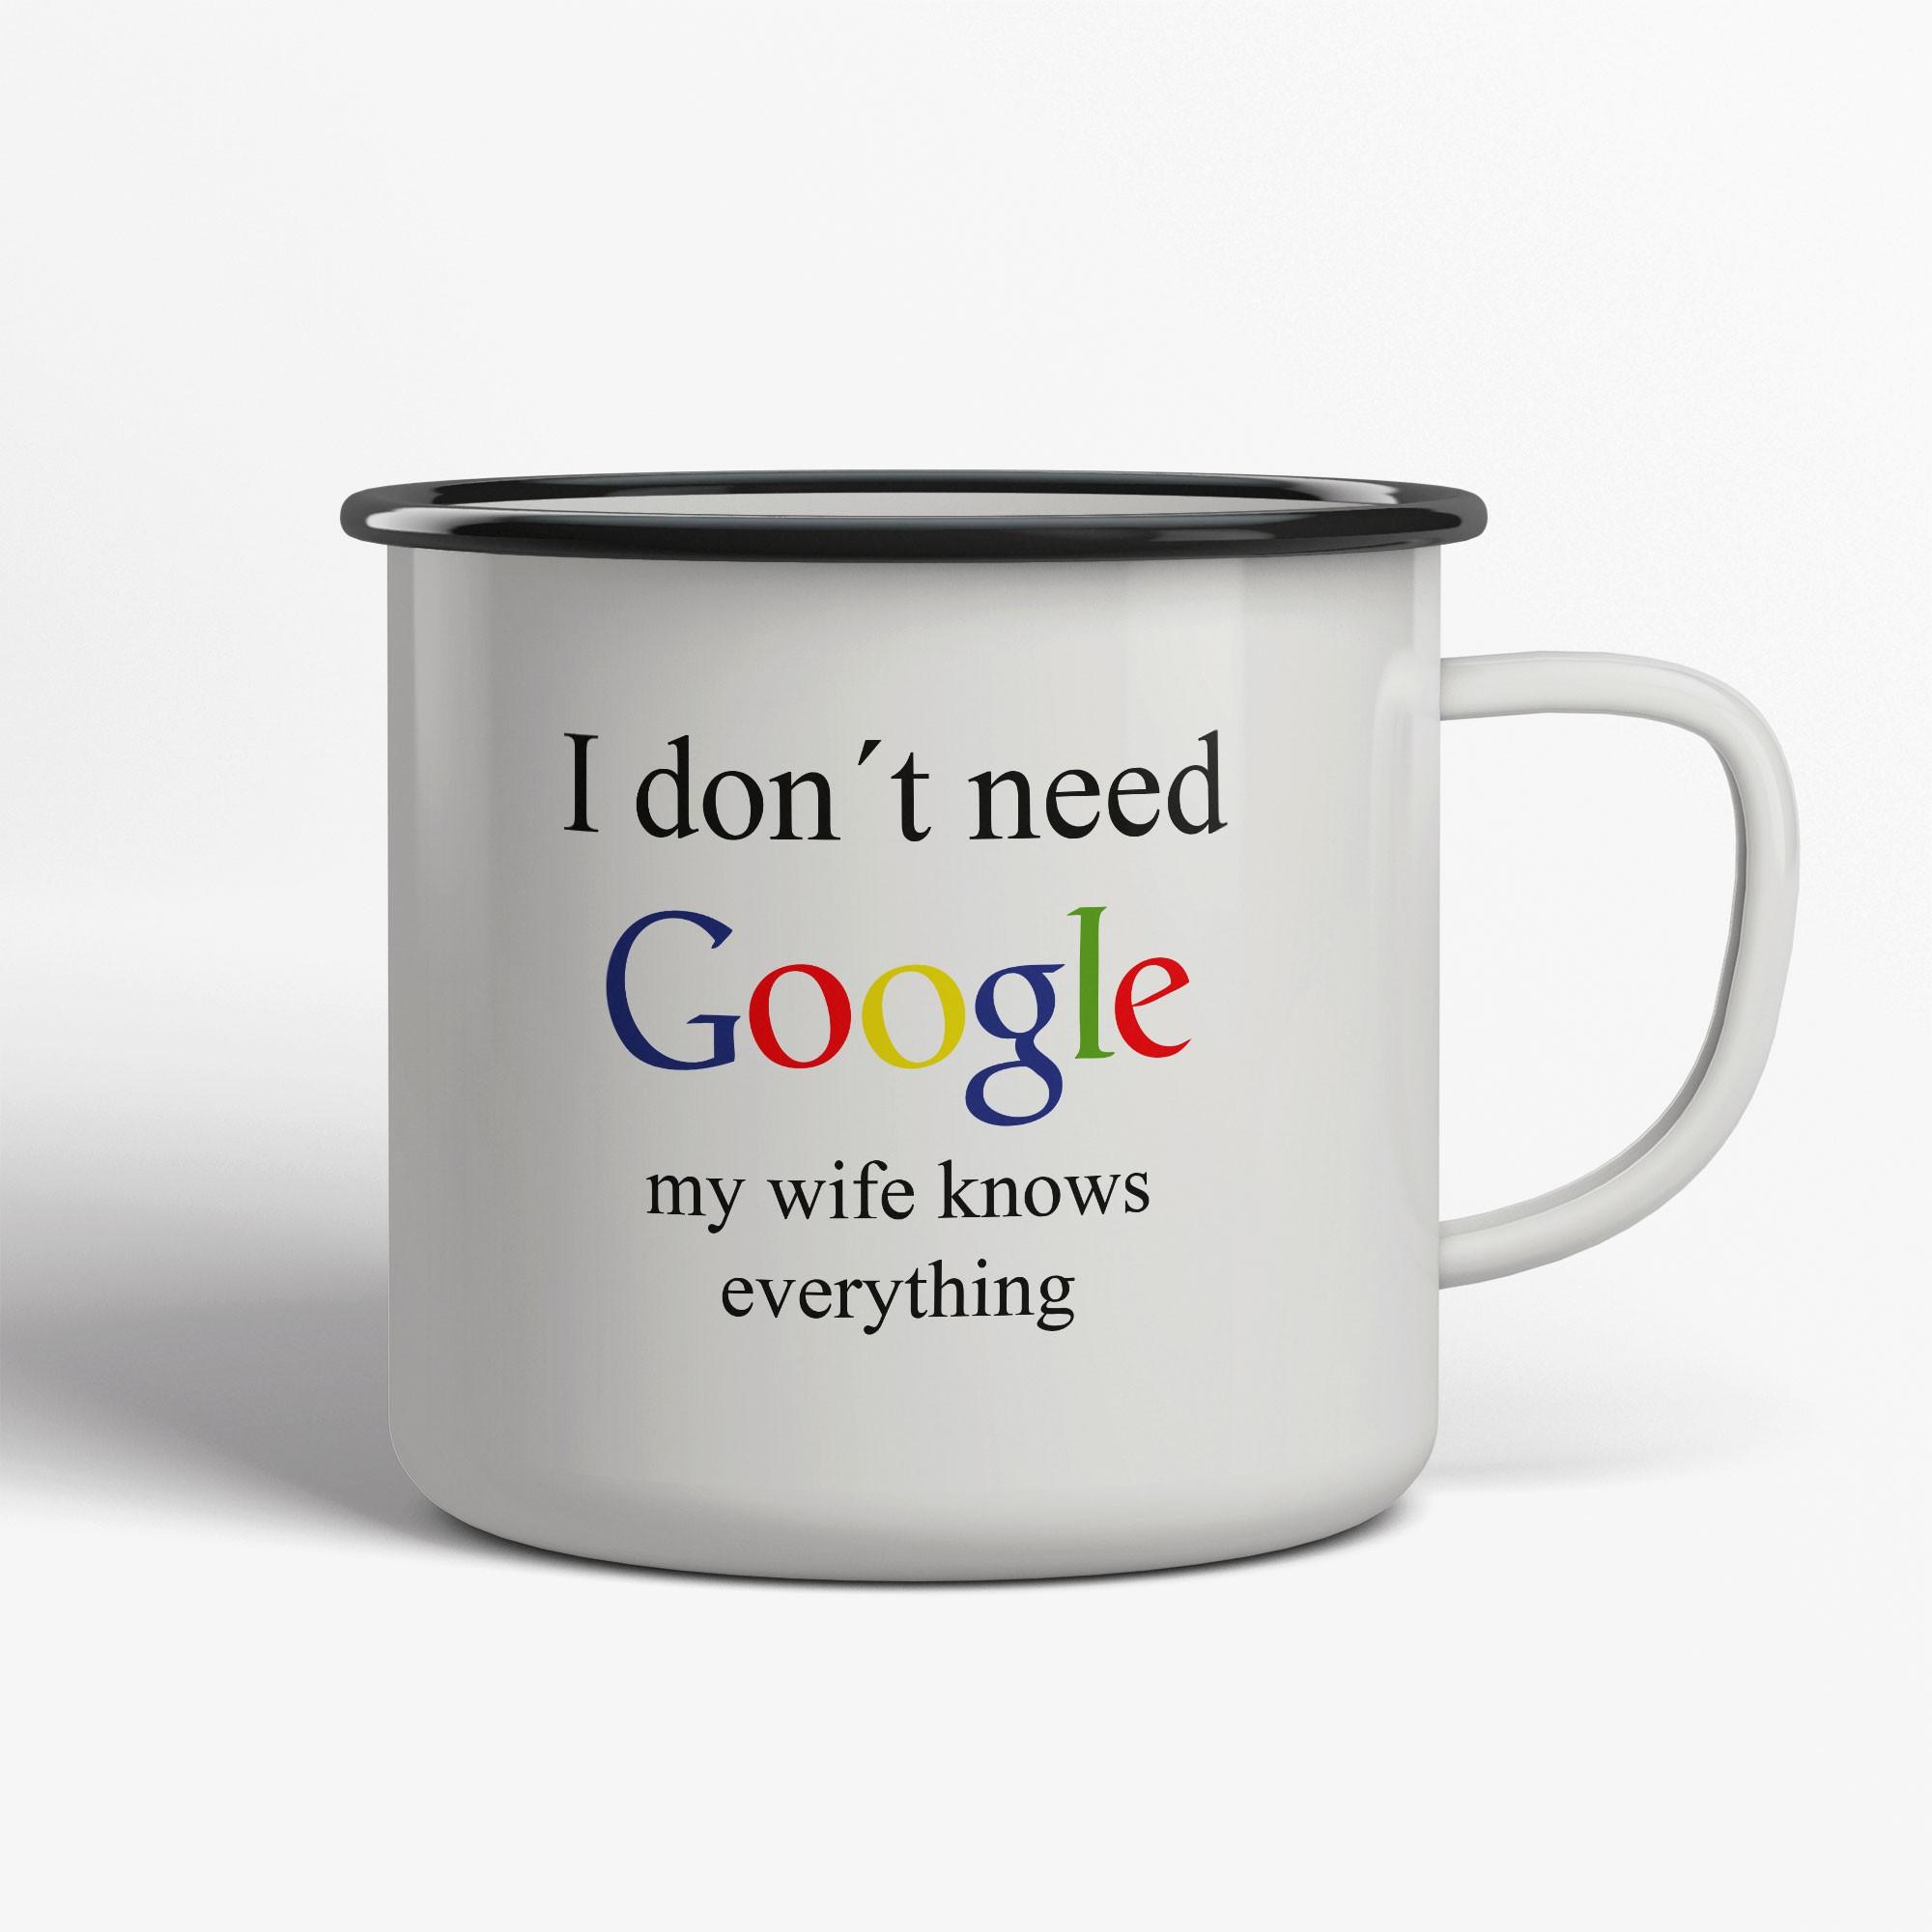 I Don't need Google My Wife Emaljmugg